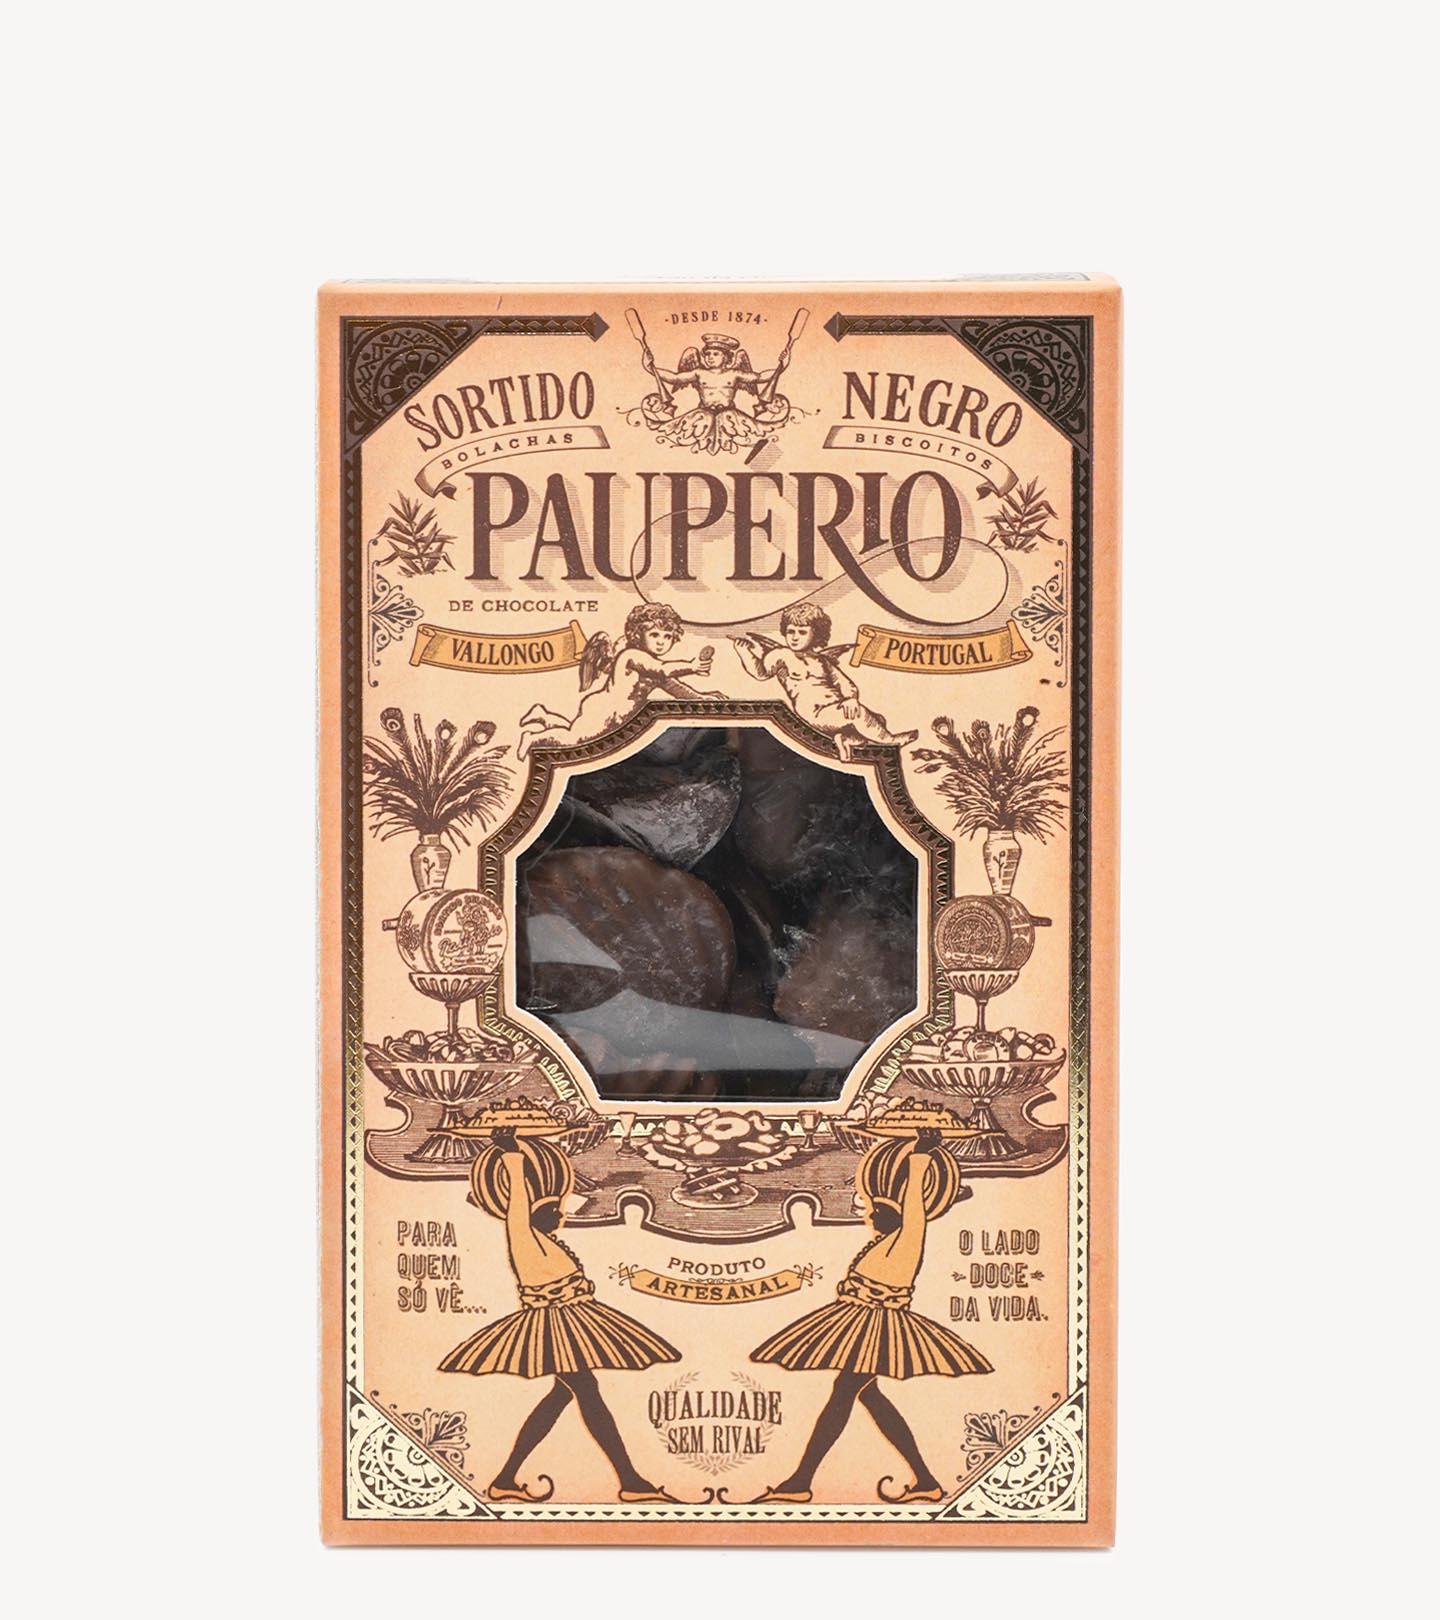 Biscoitos Sortido Negro Paupério 250g